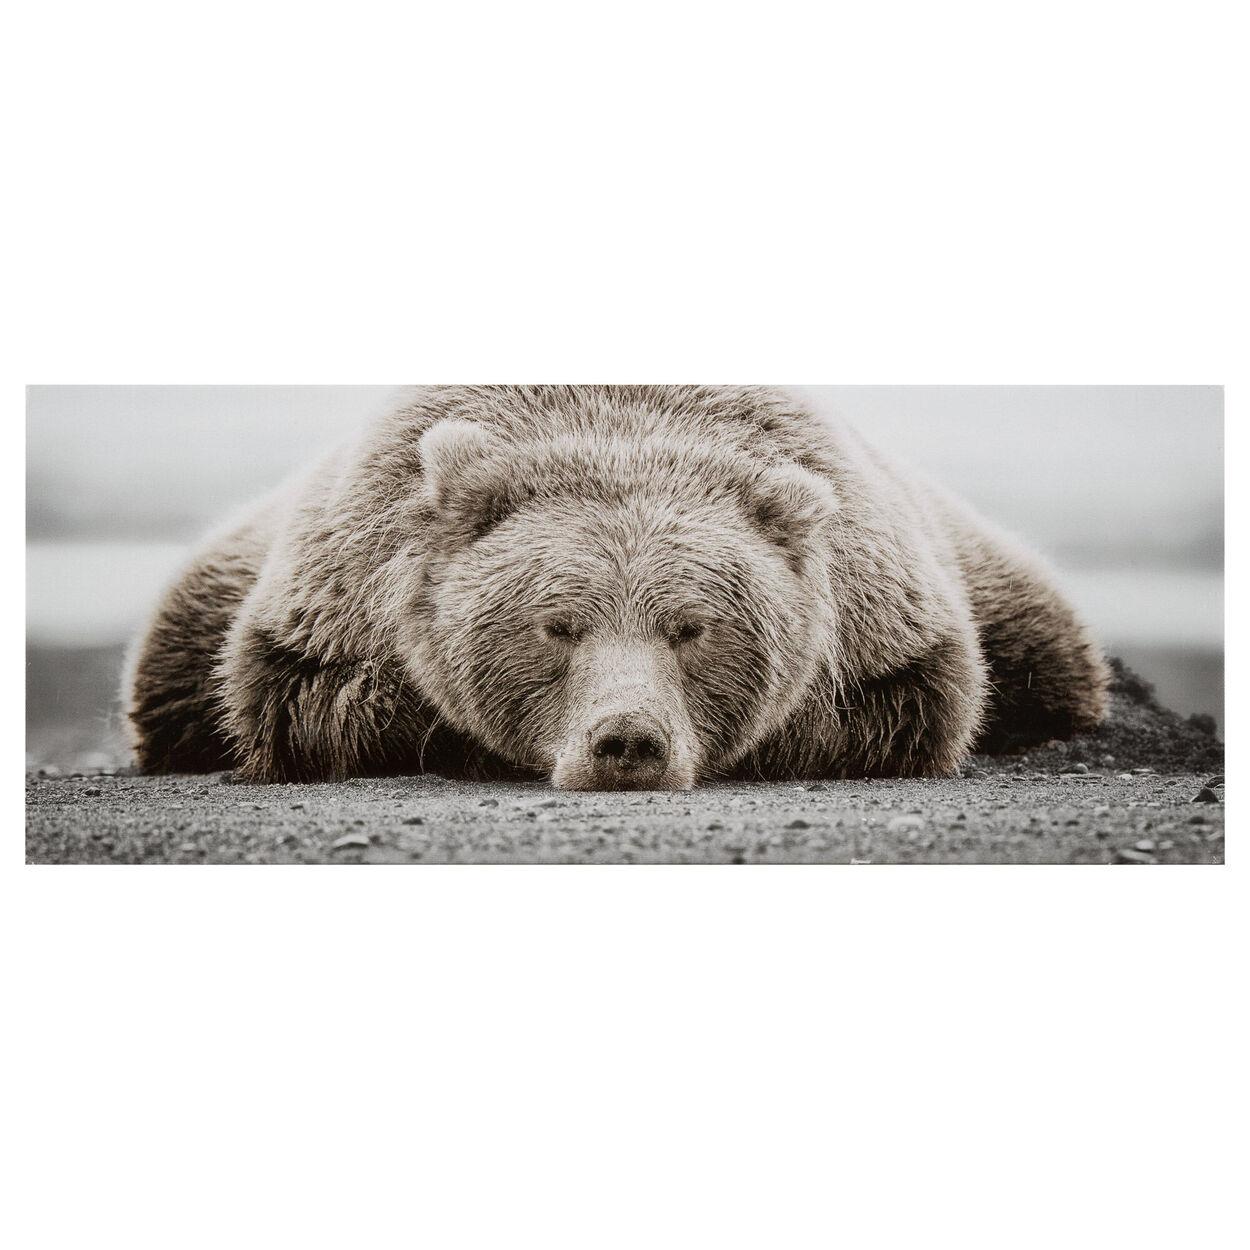 Brown Bear Small Printed Canvas